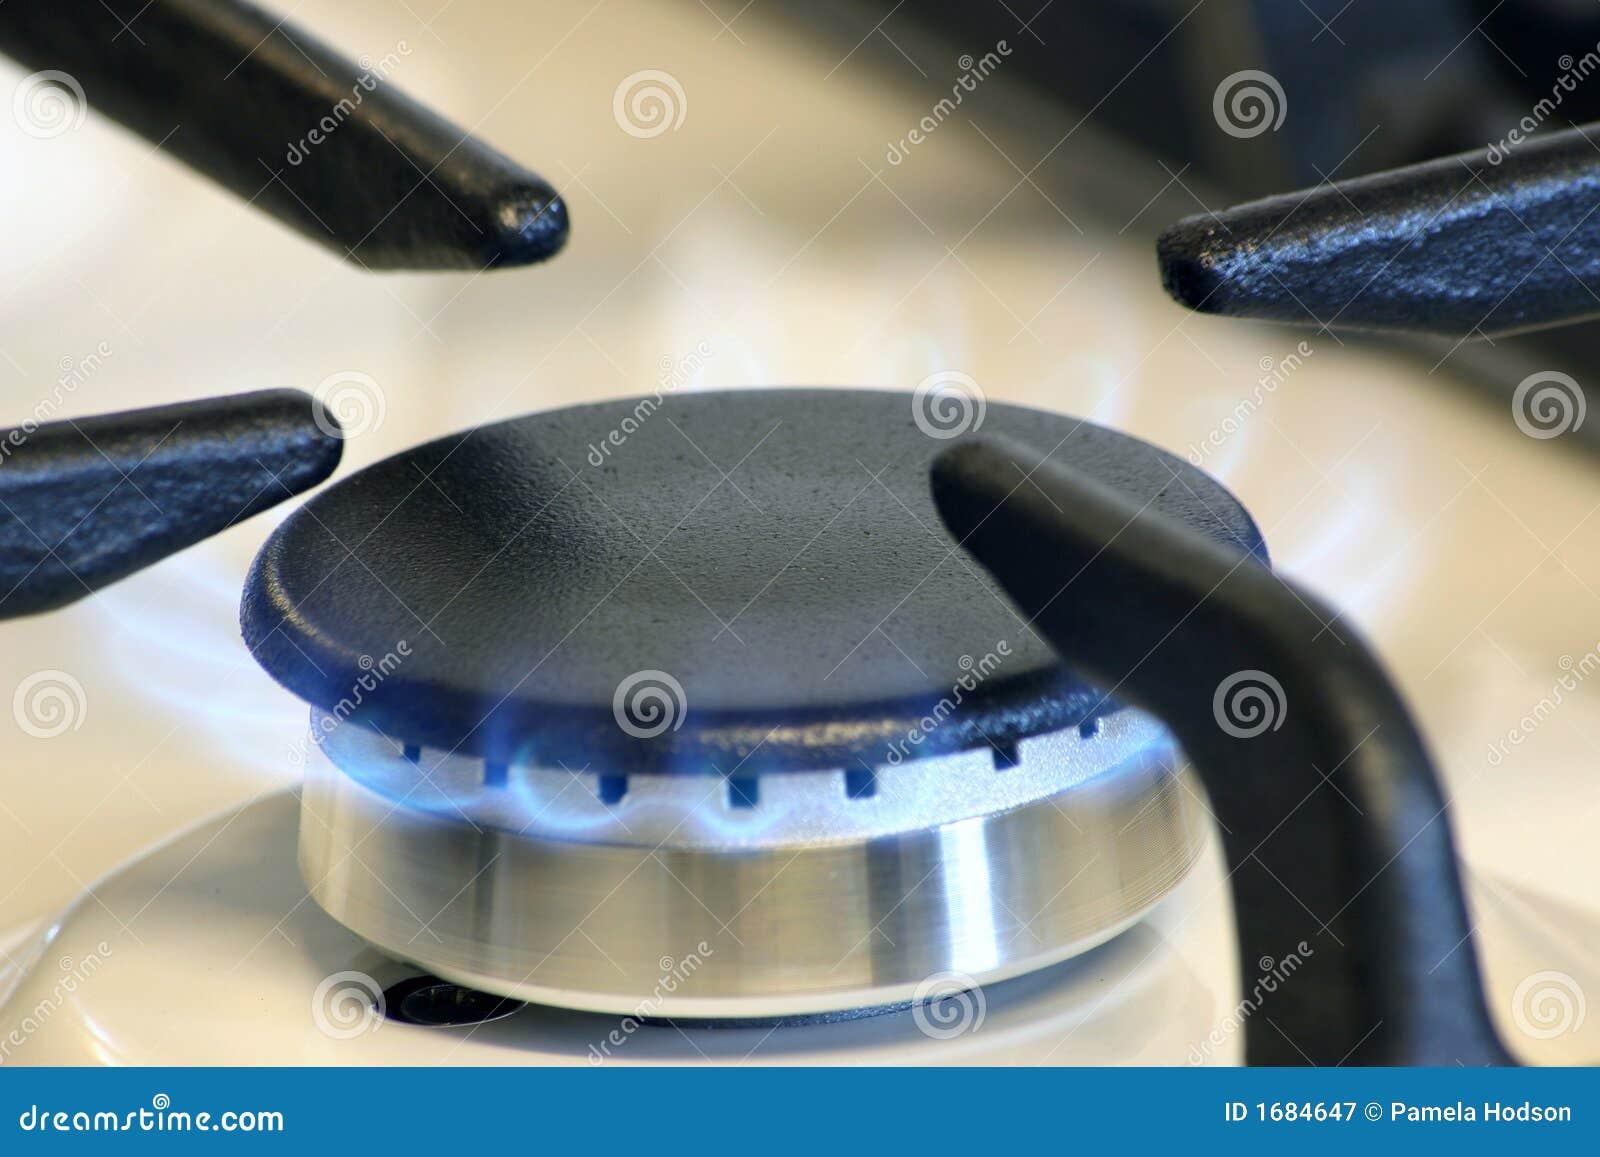 kleiner gasbrenner stockbild bild von flammen impuls 1684647. Black Bedroom Furniture Sets. Home Design Ideas